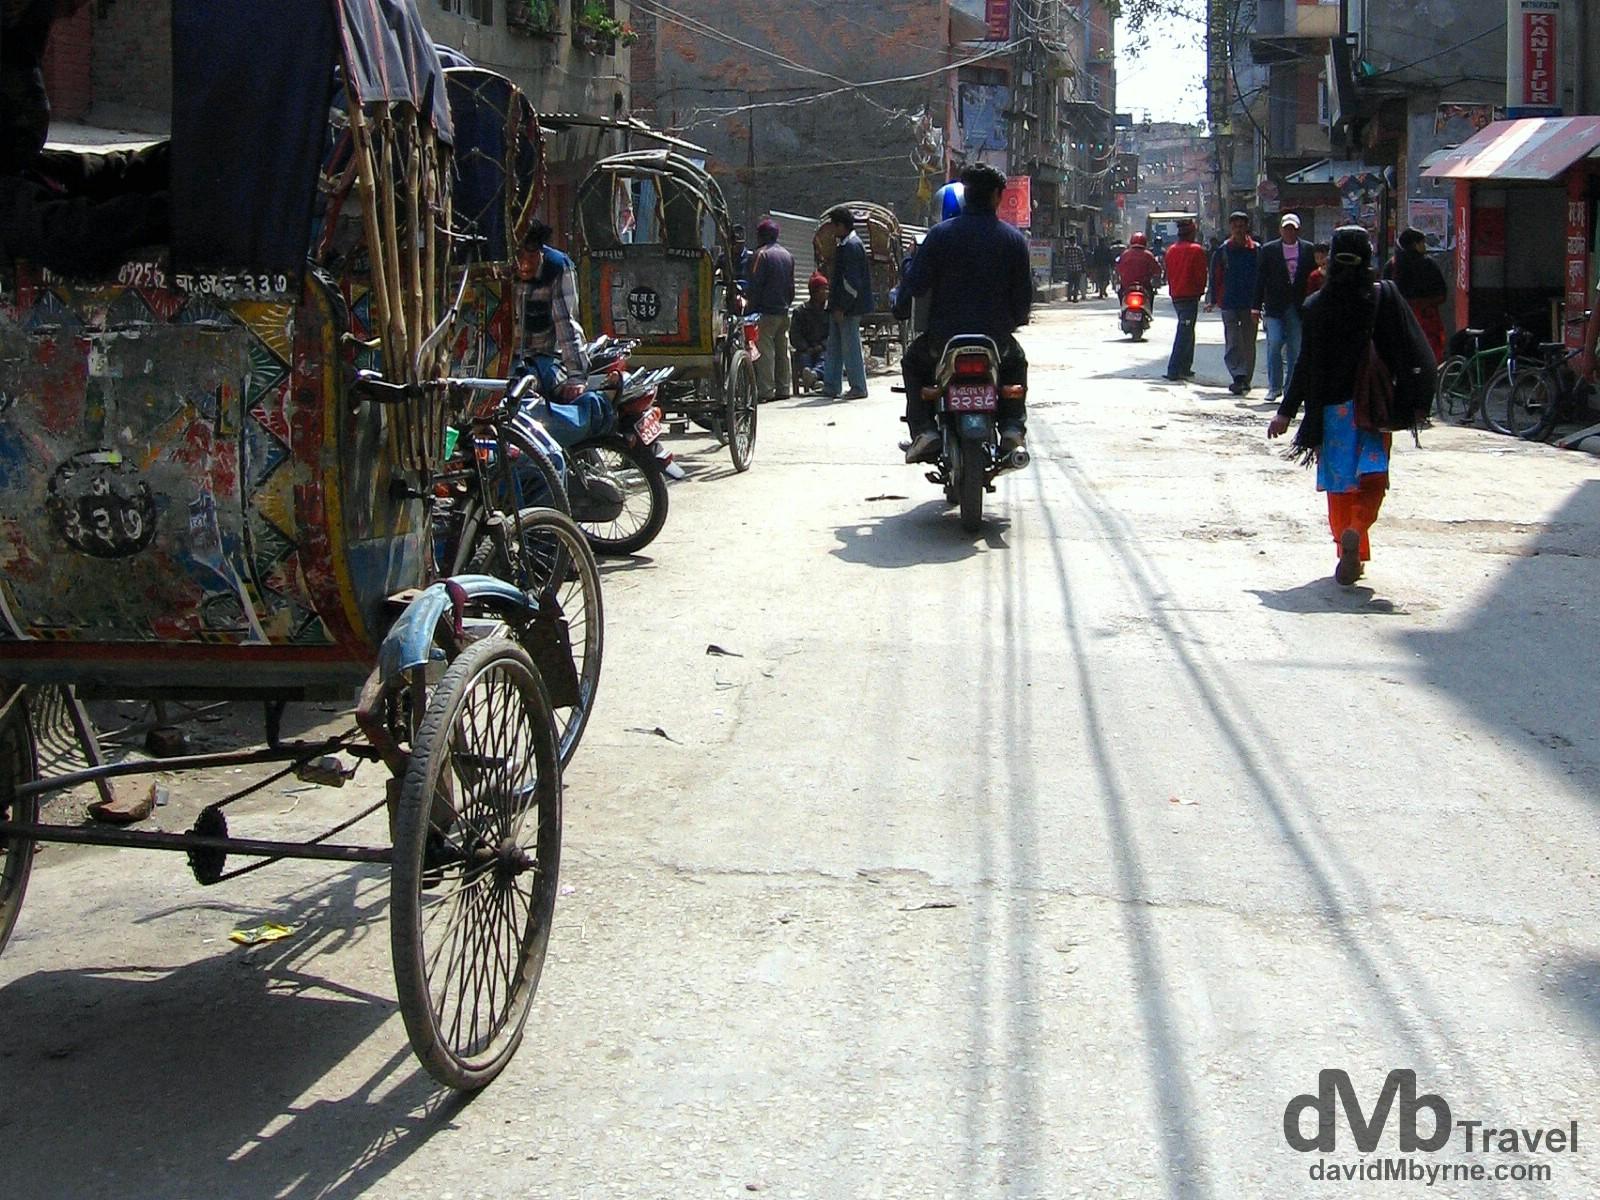 On the streets of Kathmandu, Nepal. March 7, 2008.